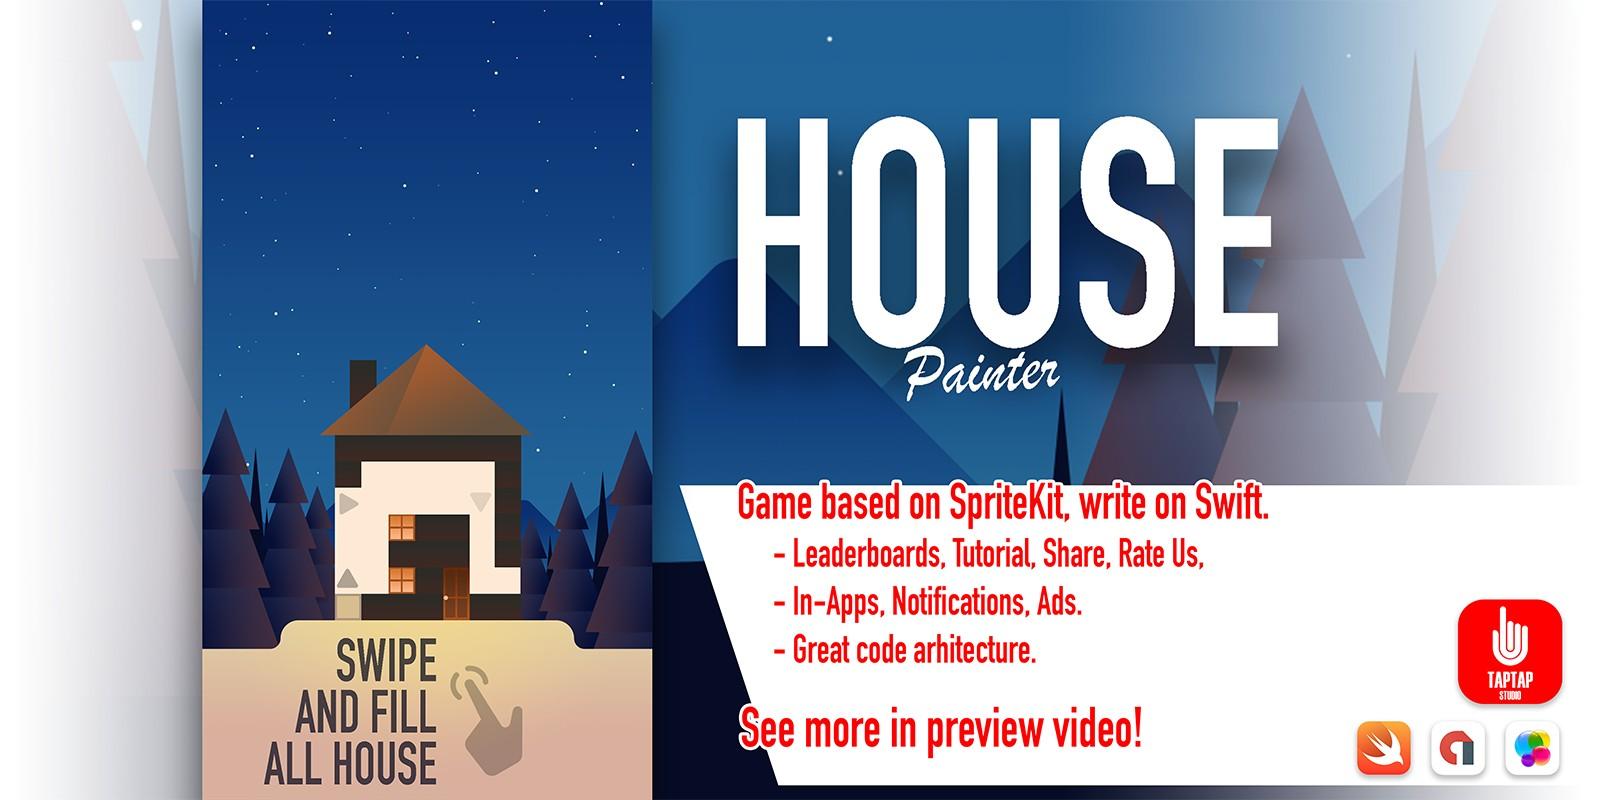 House Painter - iOS Source Code